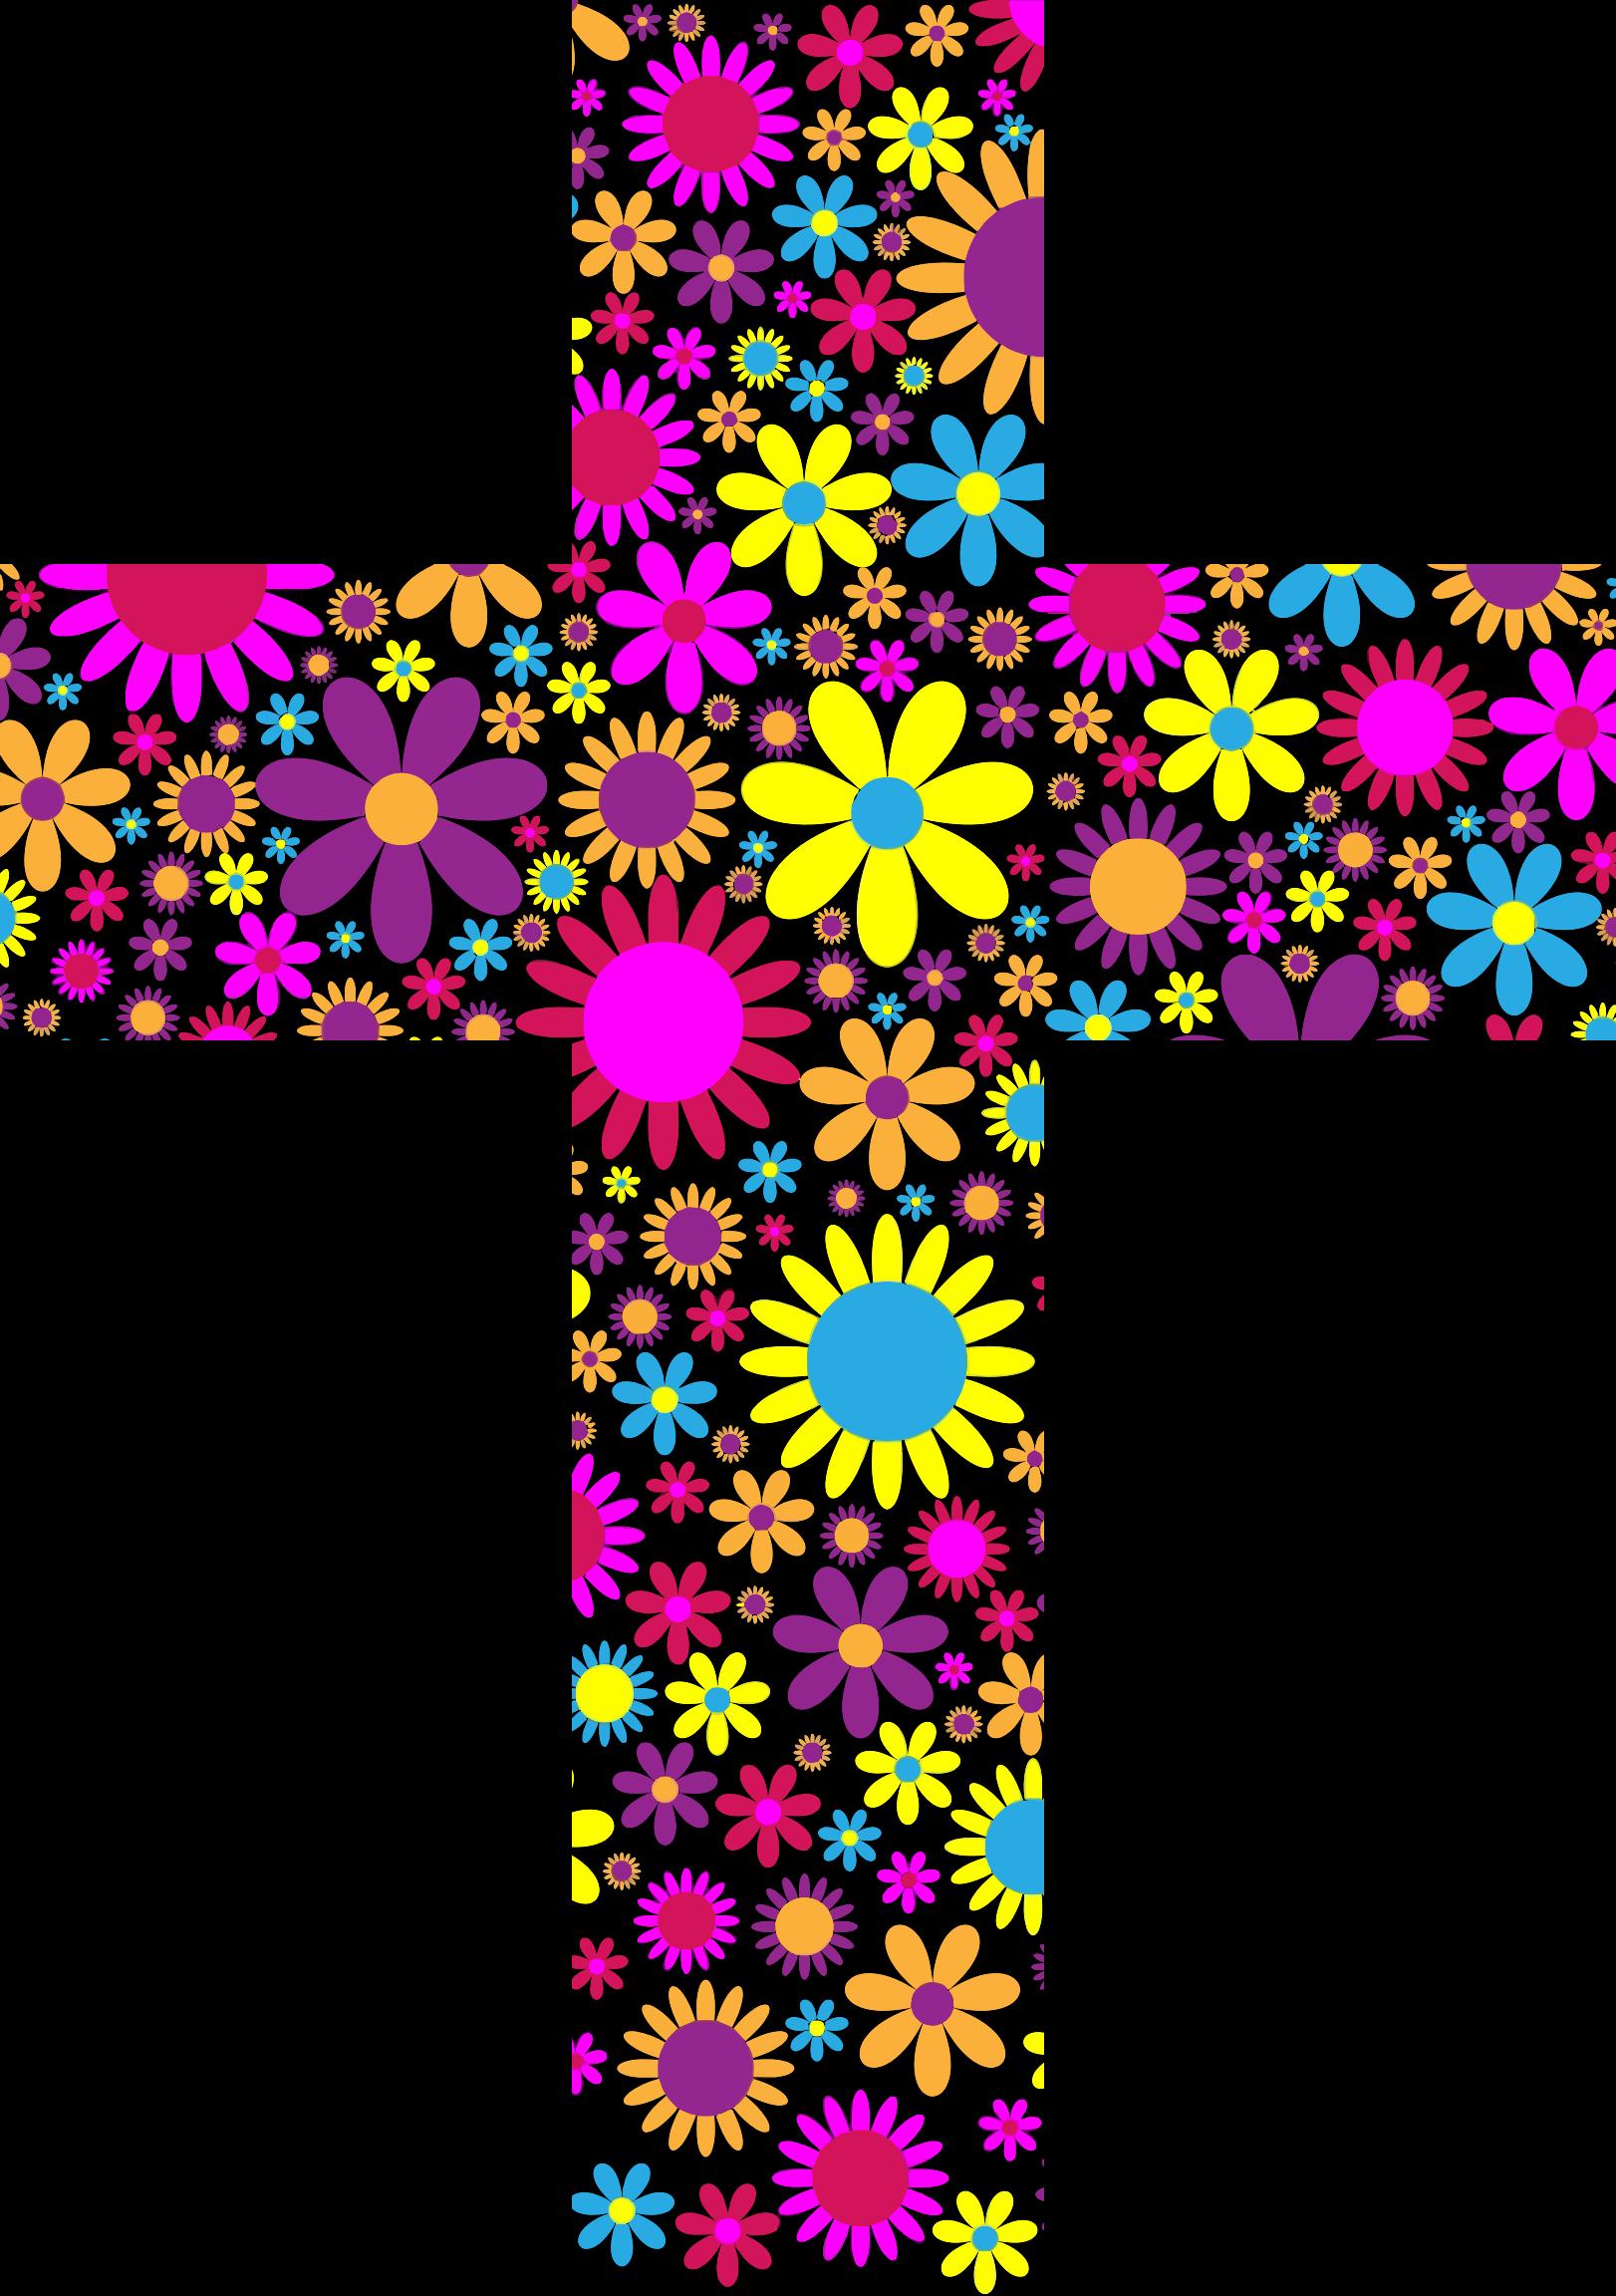 Floral big image png. Cross clipart purple